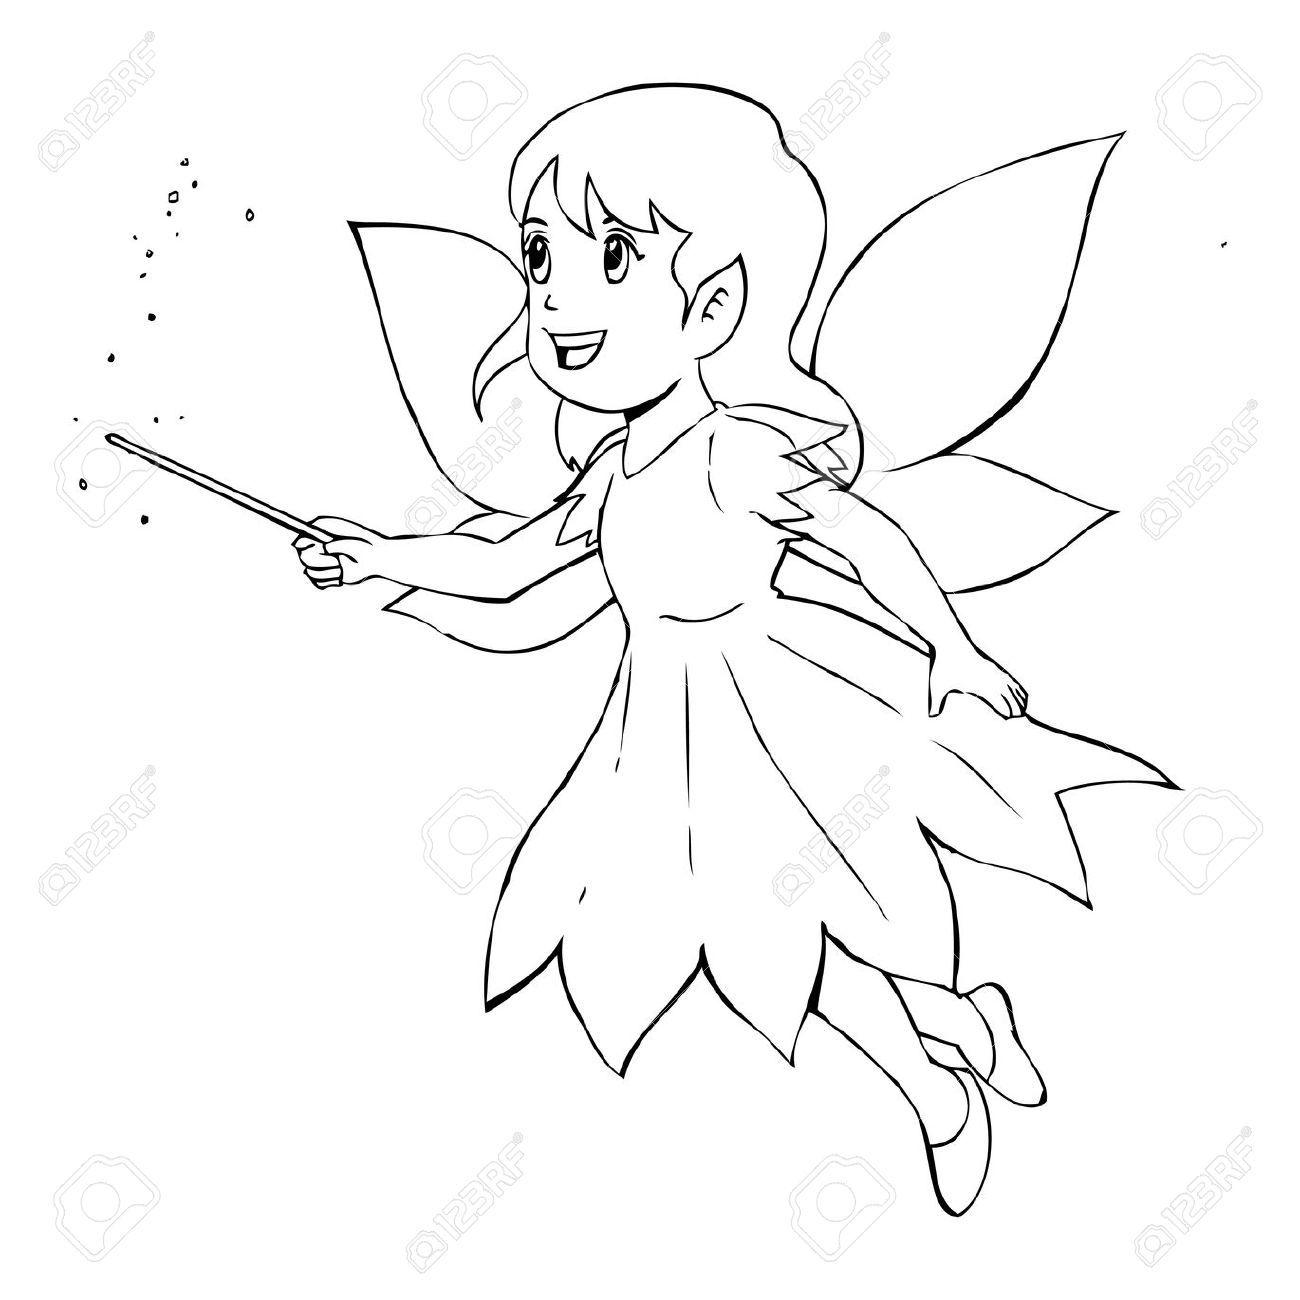 Simple Illustration Of Angels